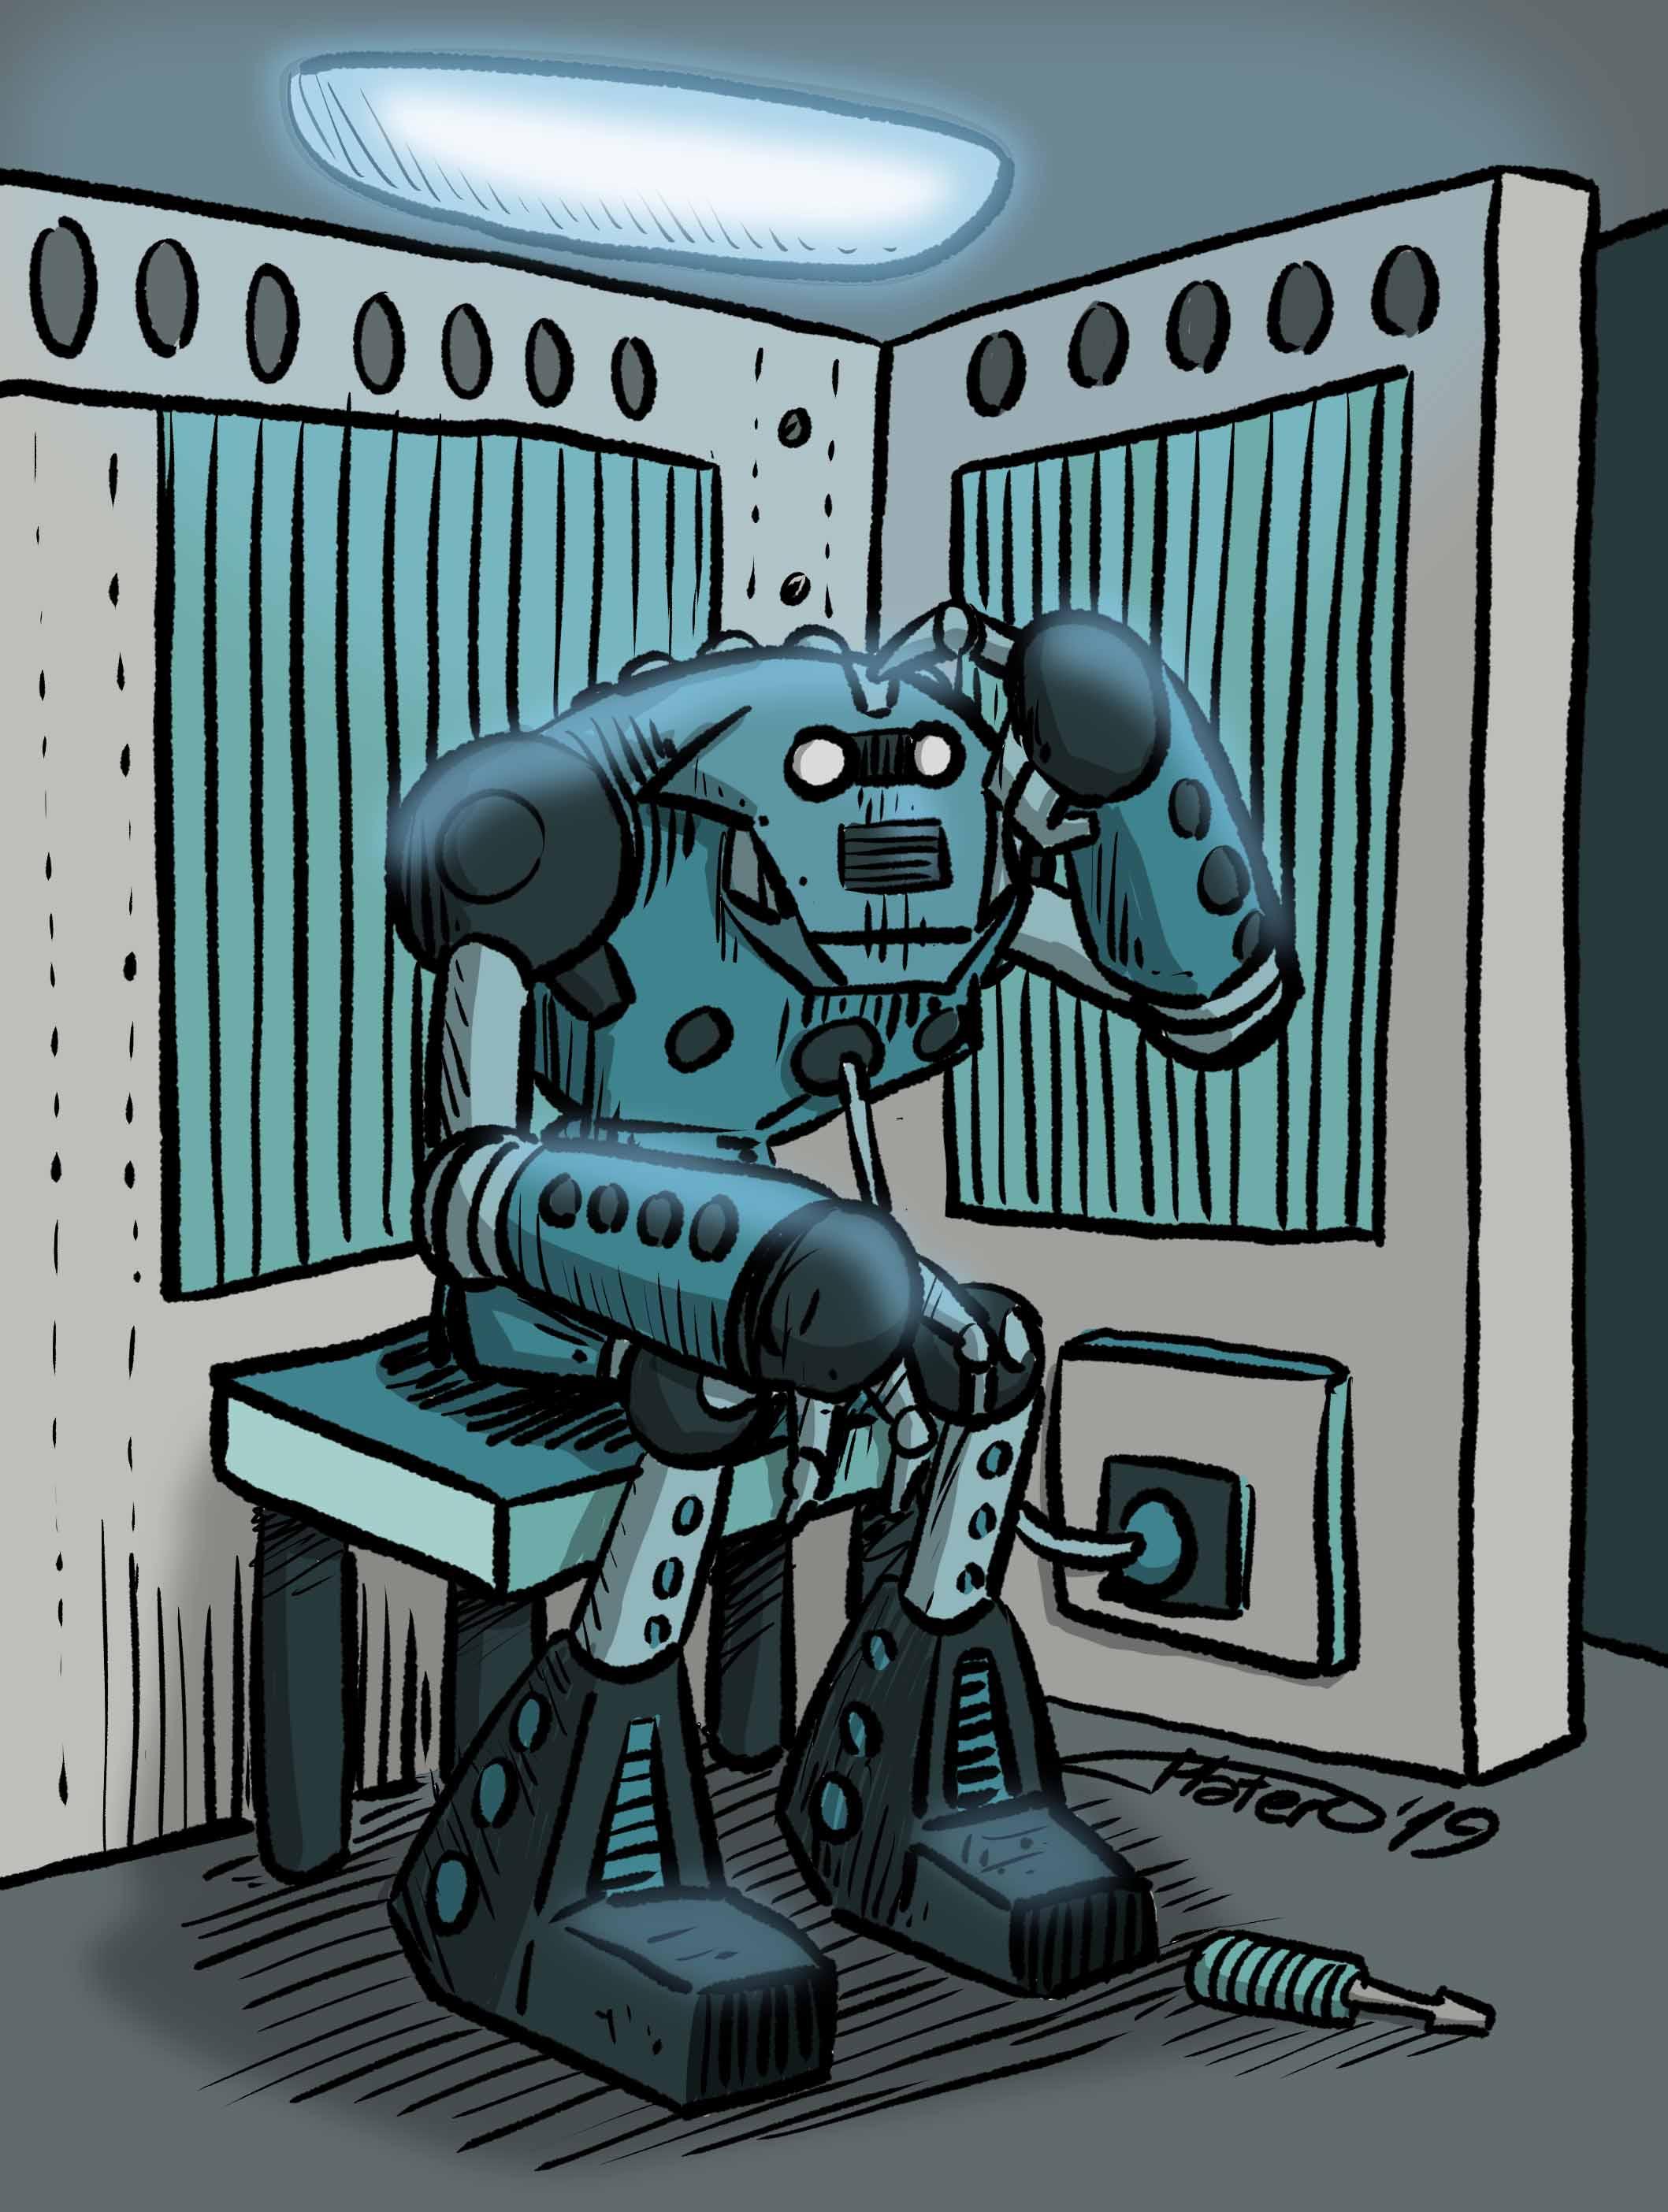 robot_2019_jose_luis_platero